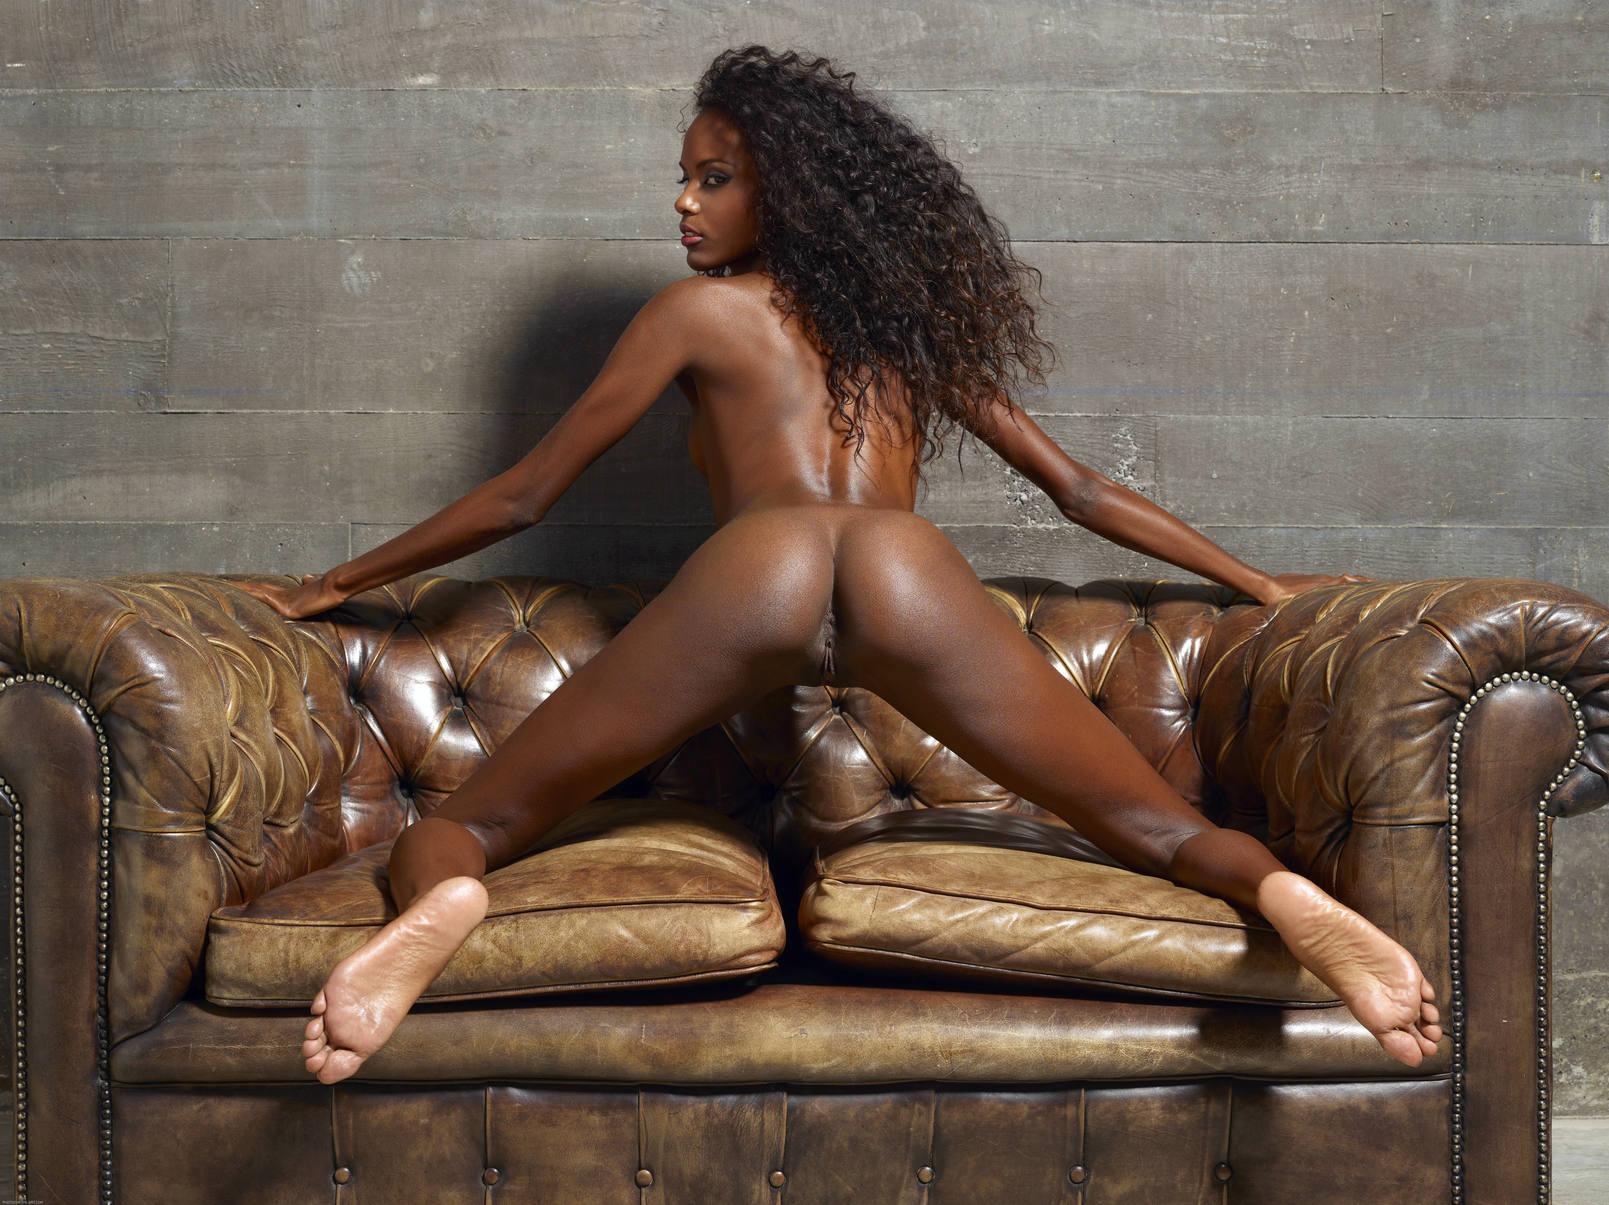 amazing tight black pussy - Nude-Ebony-Teen-Valerie-Shows-Oily-Tight-Black-Pussy_www.EroticVilla.com_7  – EroticVilla